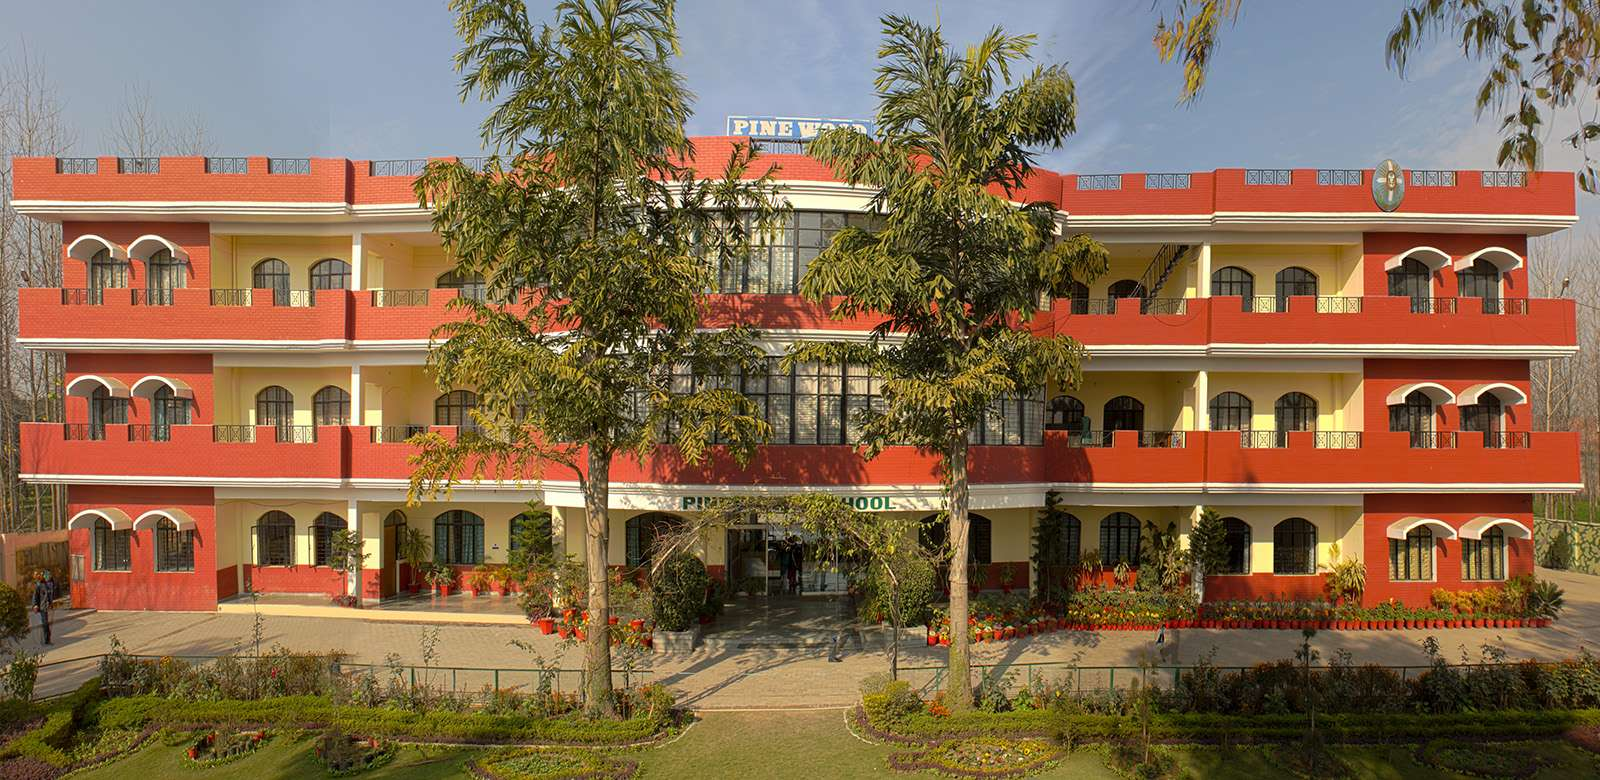 PINE WOOD SCHOOL VILLAGE CHUNHETI DELHI ROAD SAHARANPUR UP 2130712